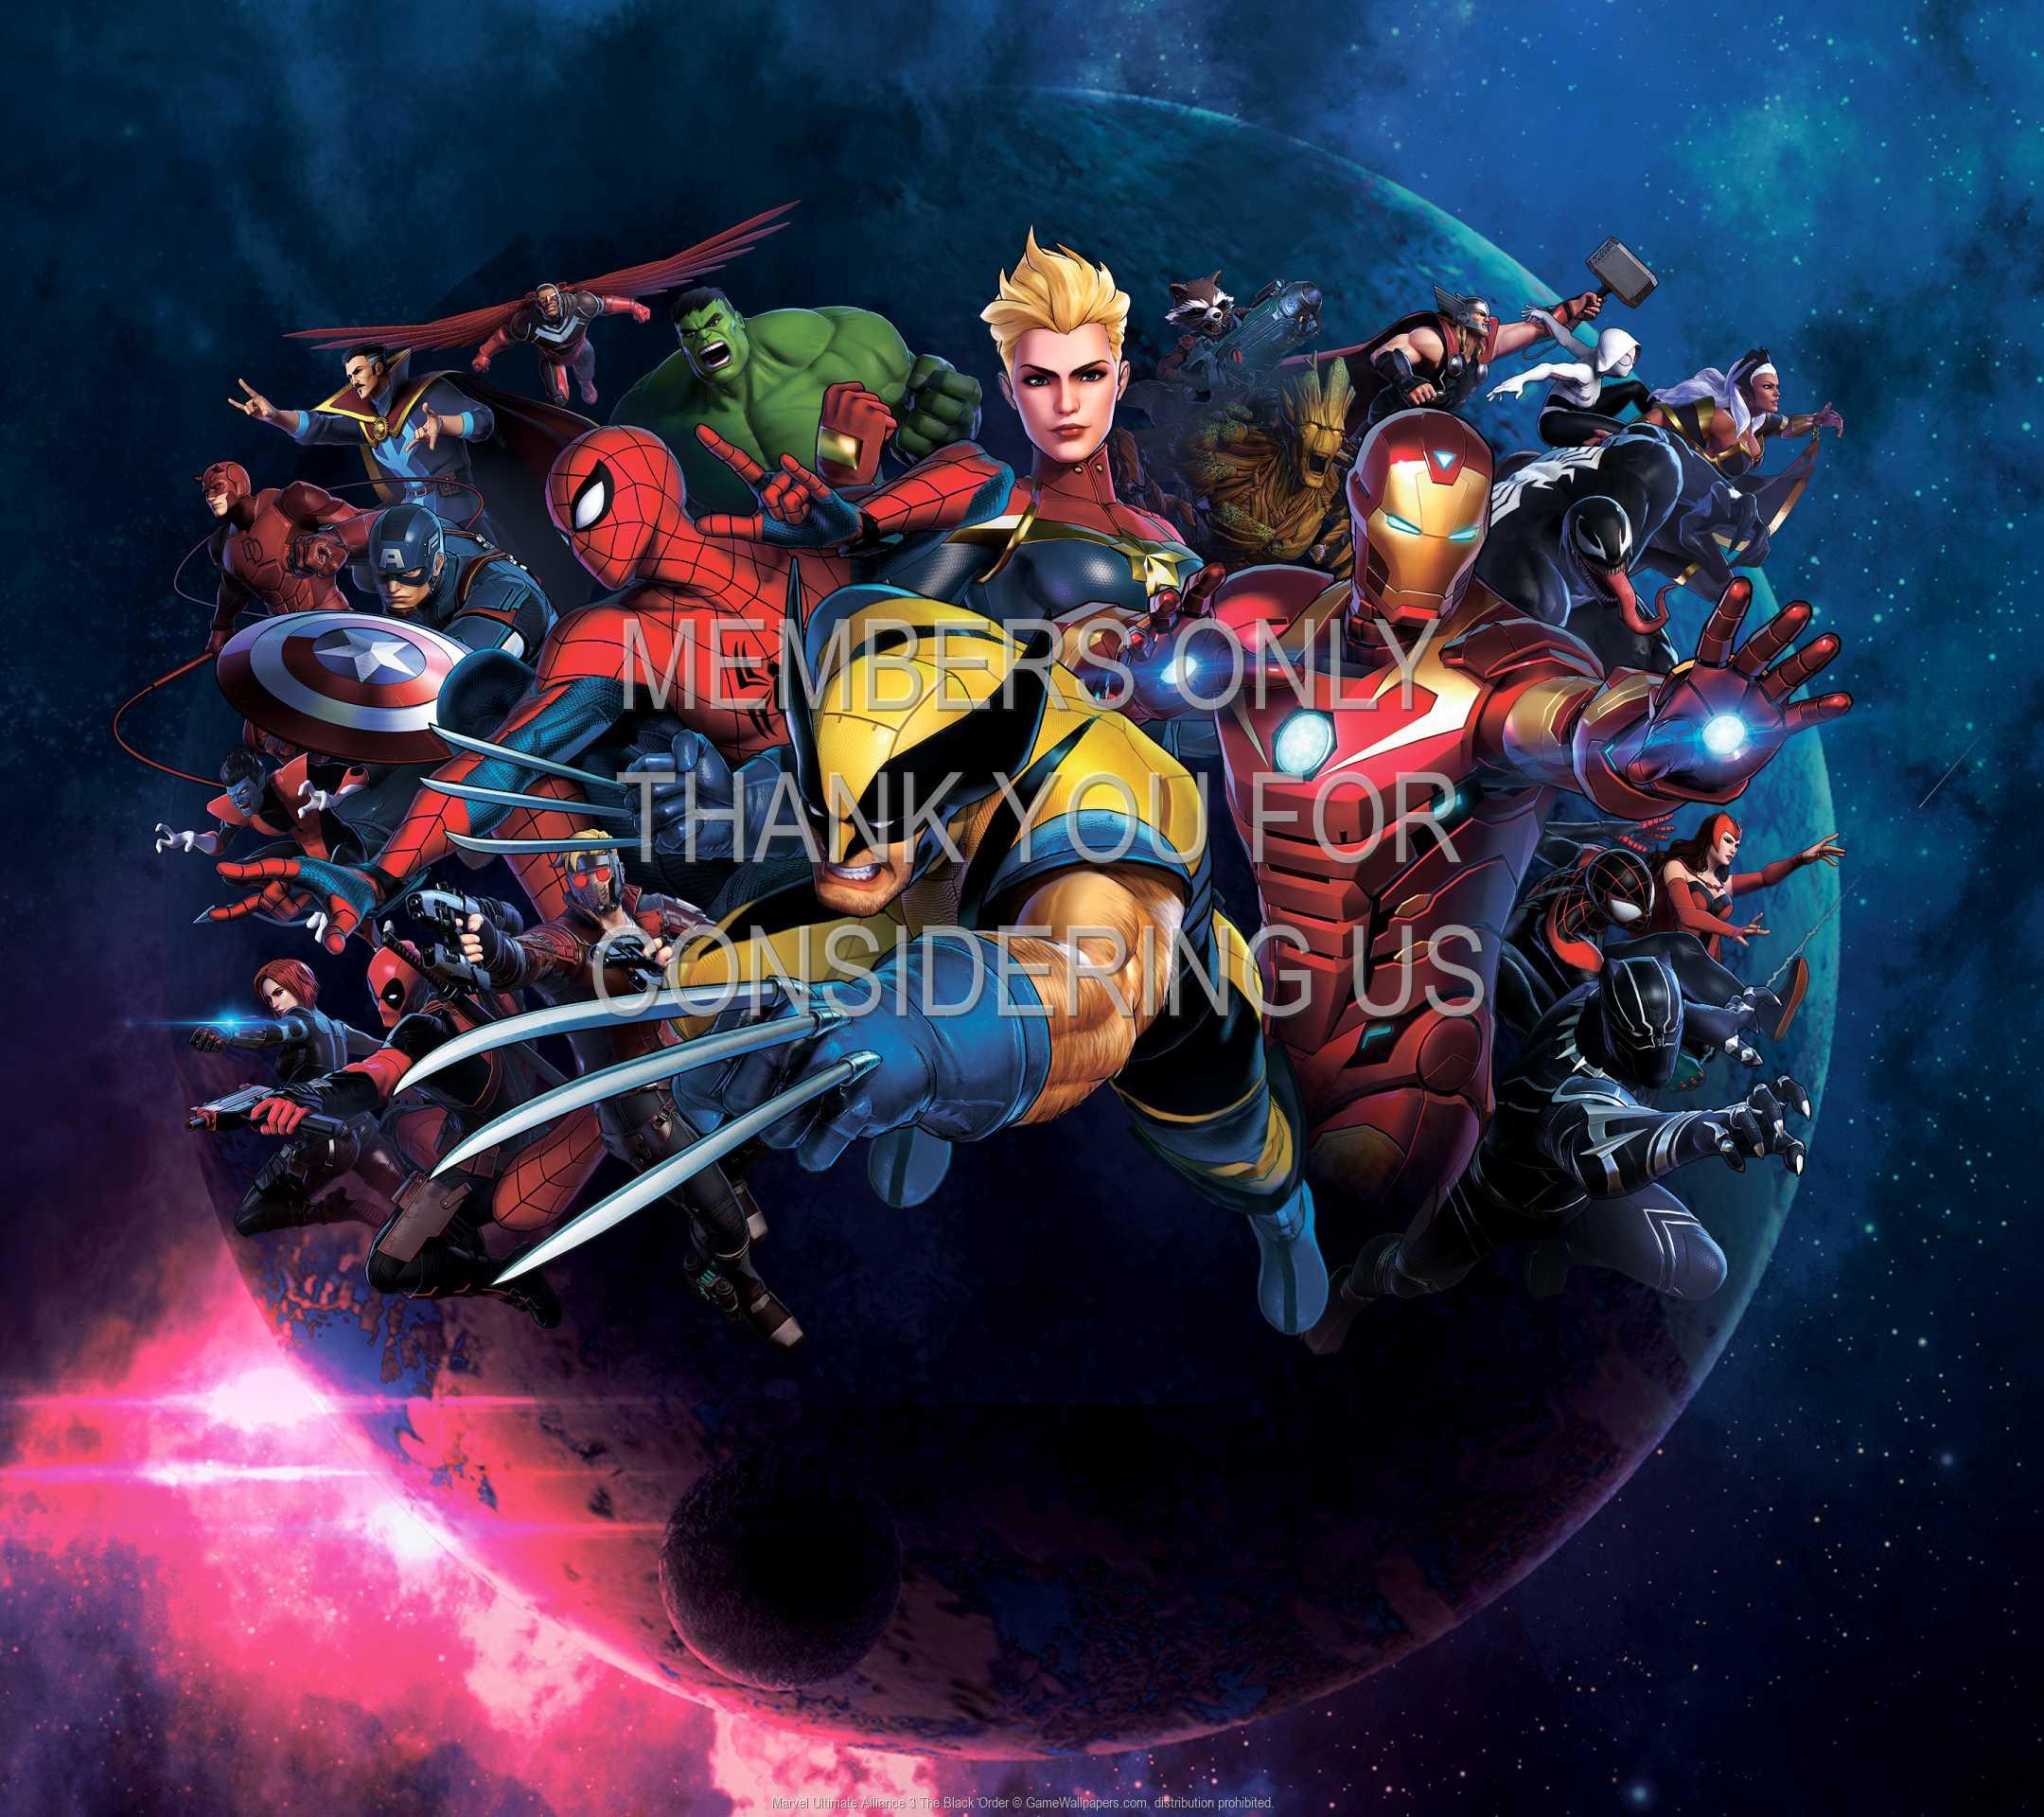 Marvel Ultimate Alliance 3: The Black Order 1080p Horizontal Mobile wallpaper or background 01